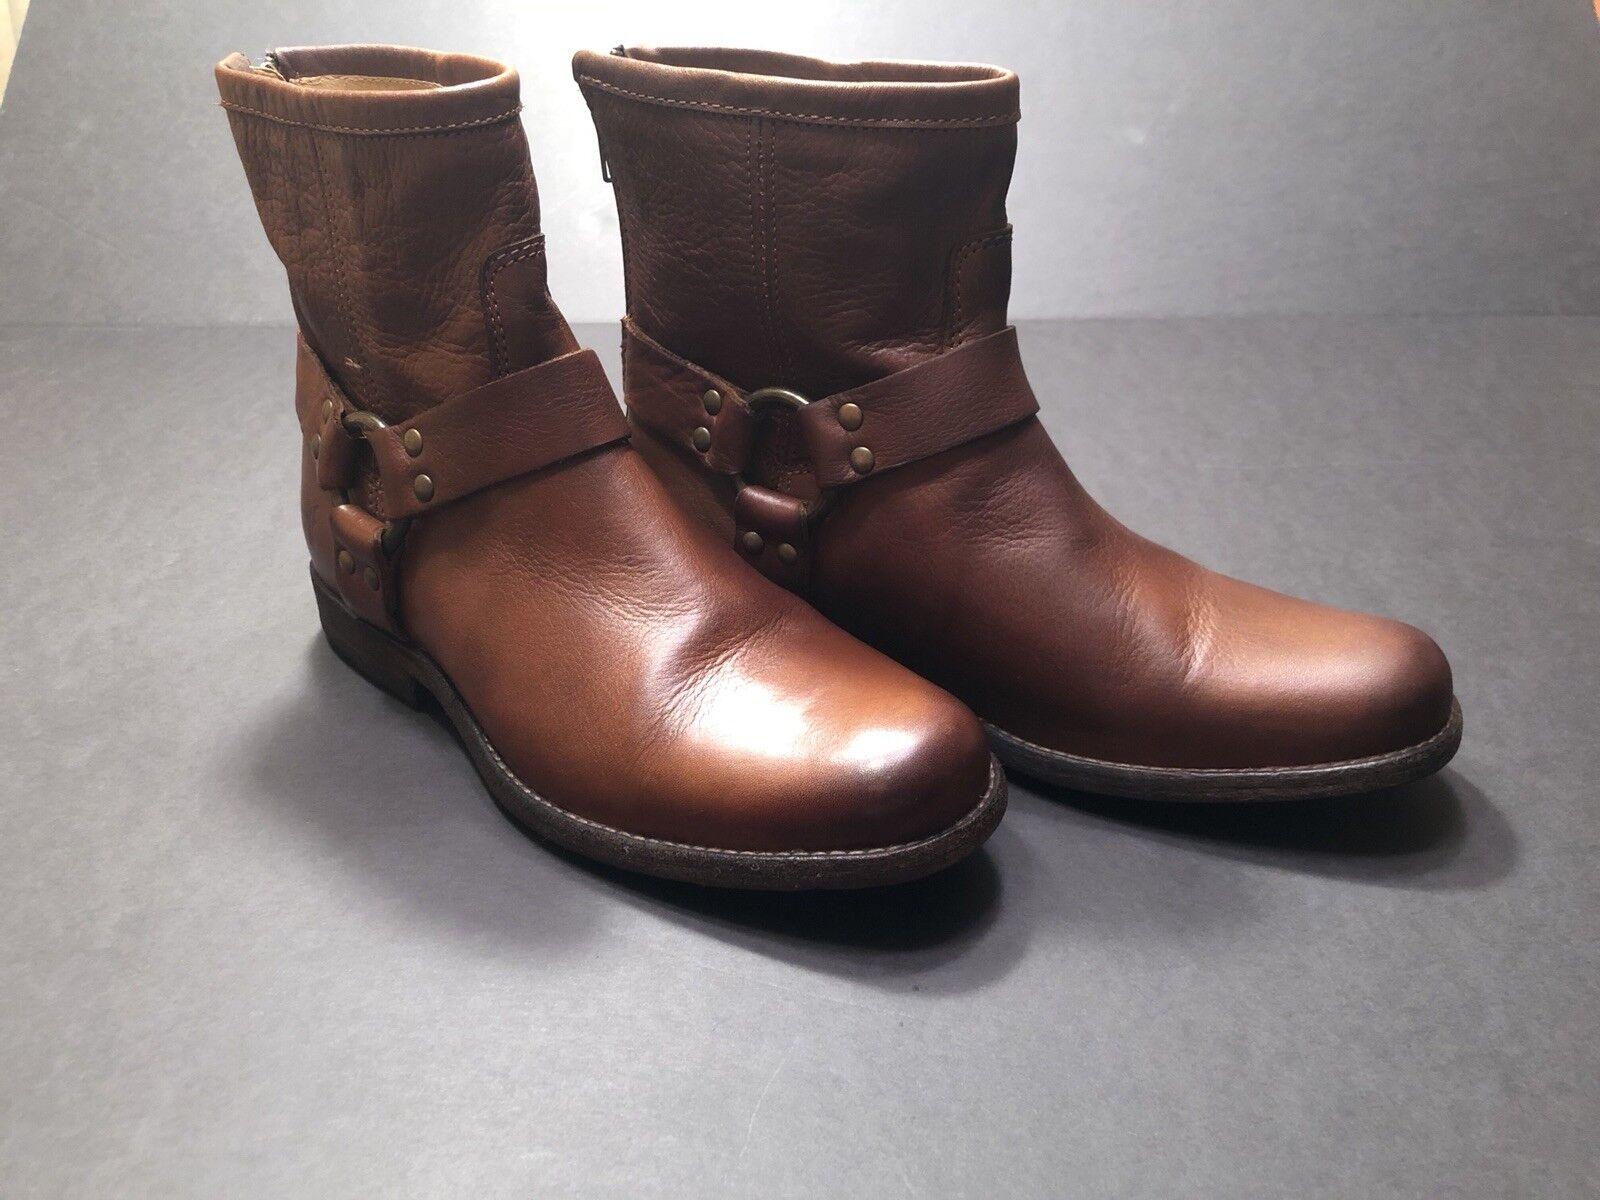 Frye Women's Phillip Harness Boots - Round Toe Toe Toe s n 3476870 9c529d